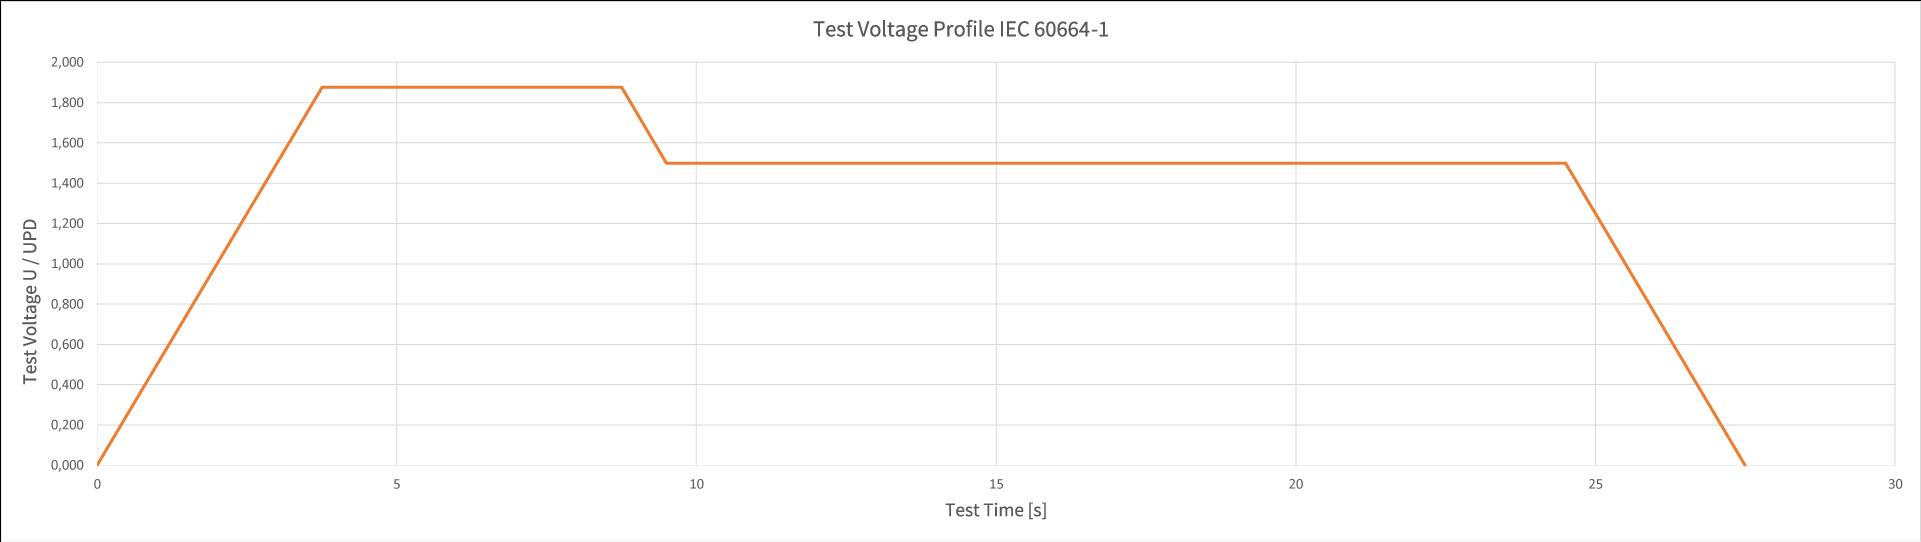 Test-Voltage-Profile-IEC60664-1